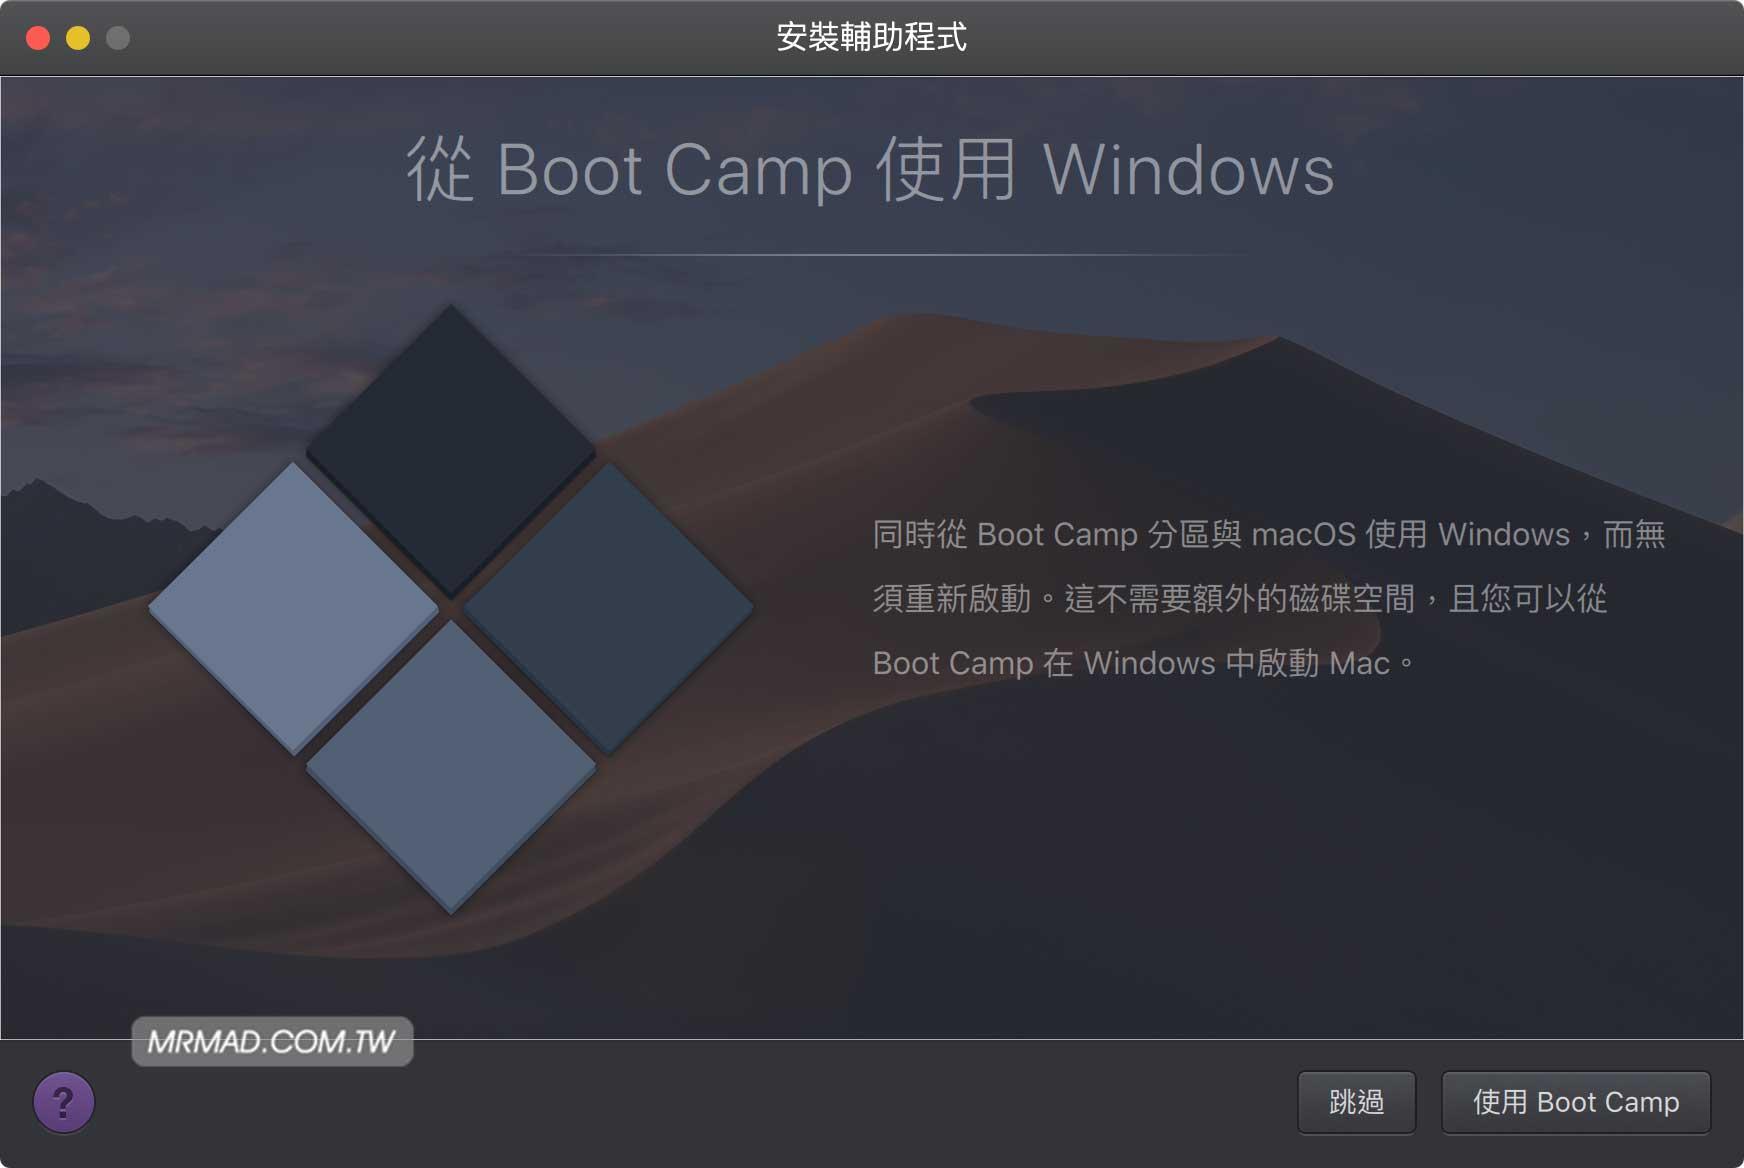 Parallels Desktop教學技巧:替Mac安裝Windows 10 完全沒煩惱